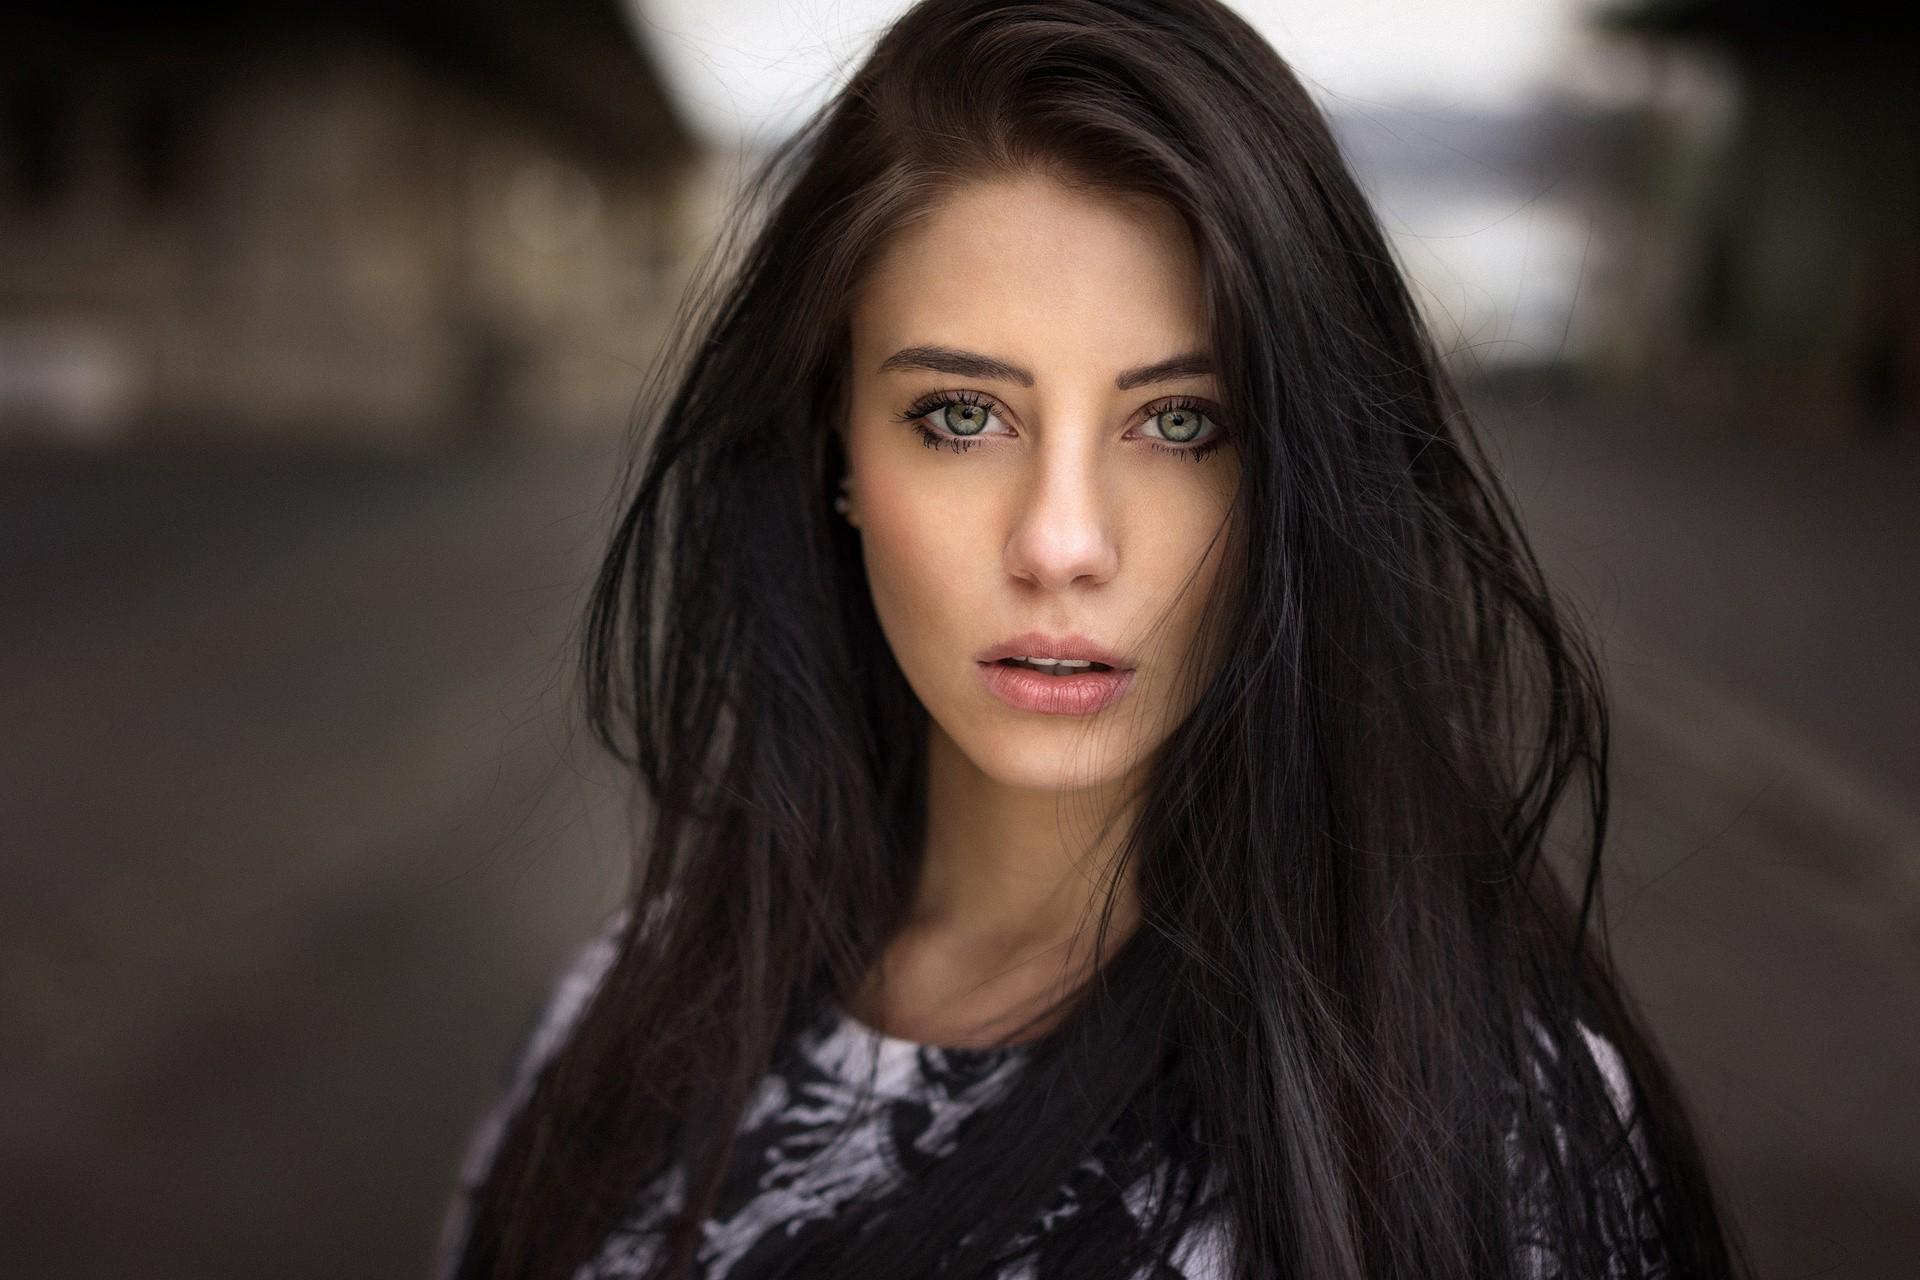 Wallpaper Face Women Model Depth Of Field Long Hair